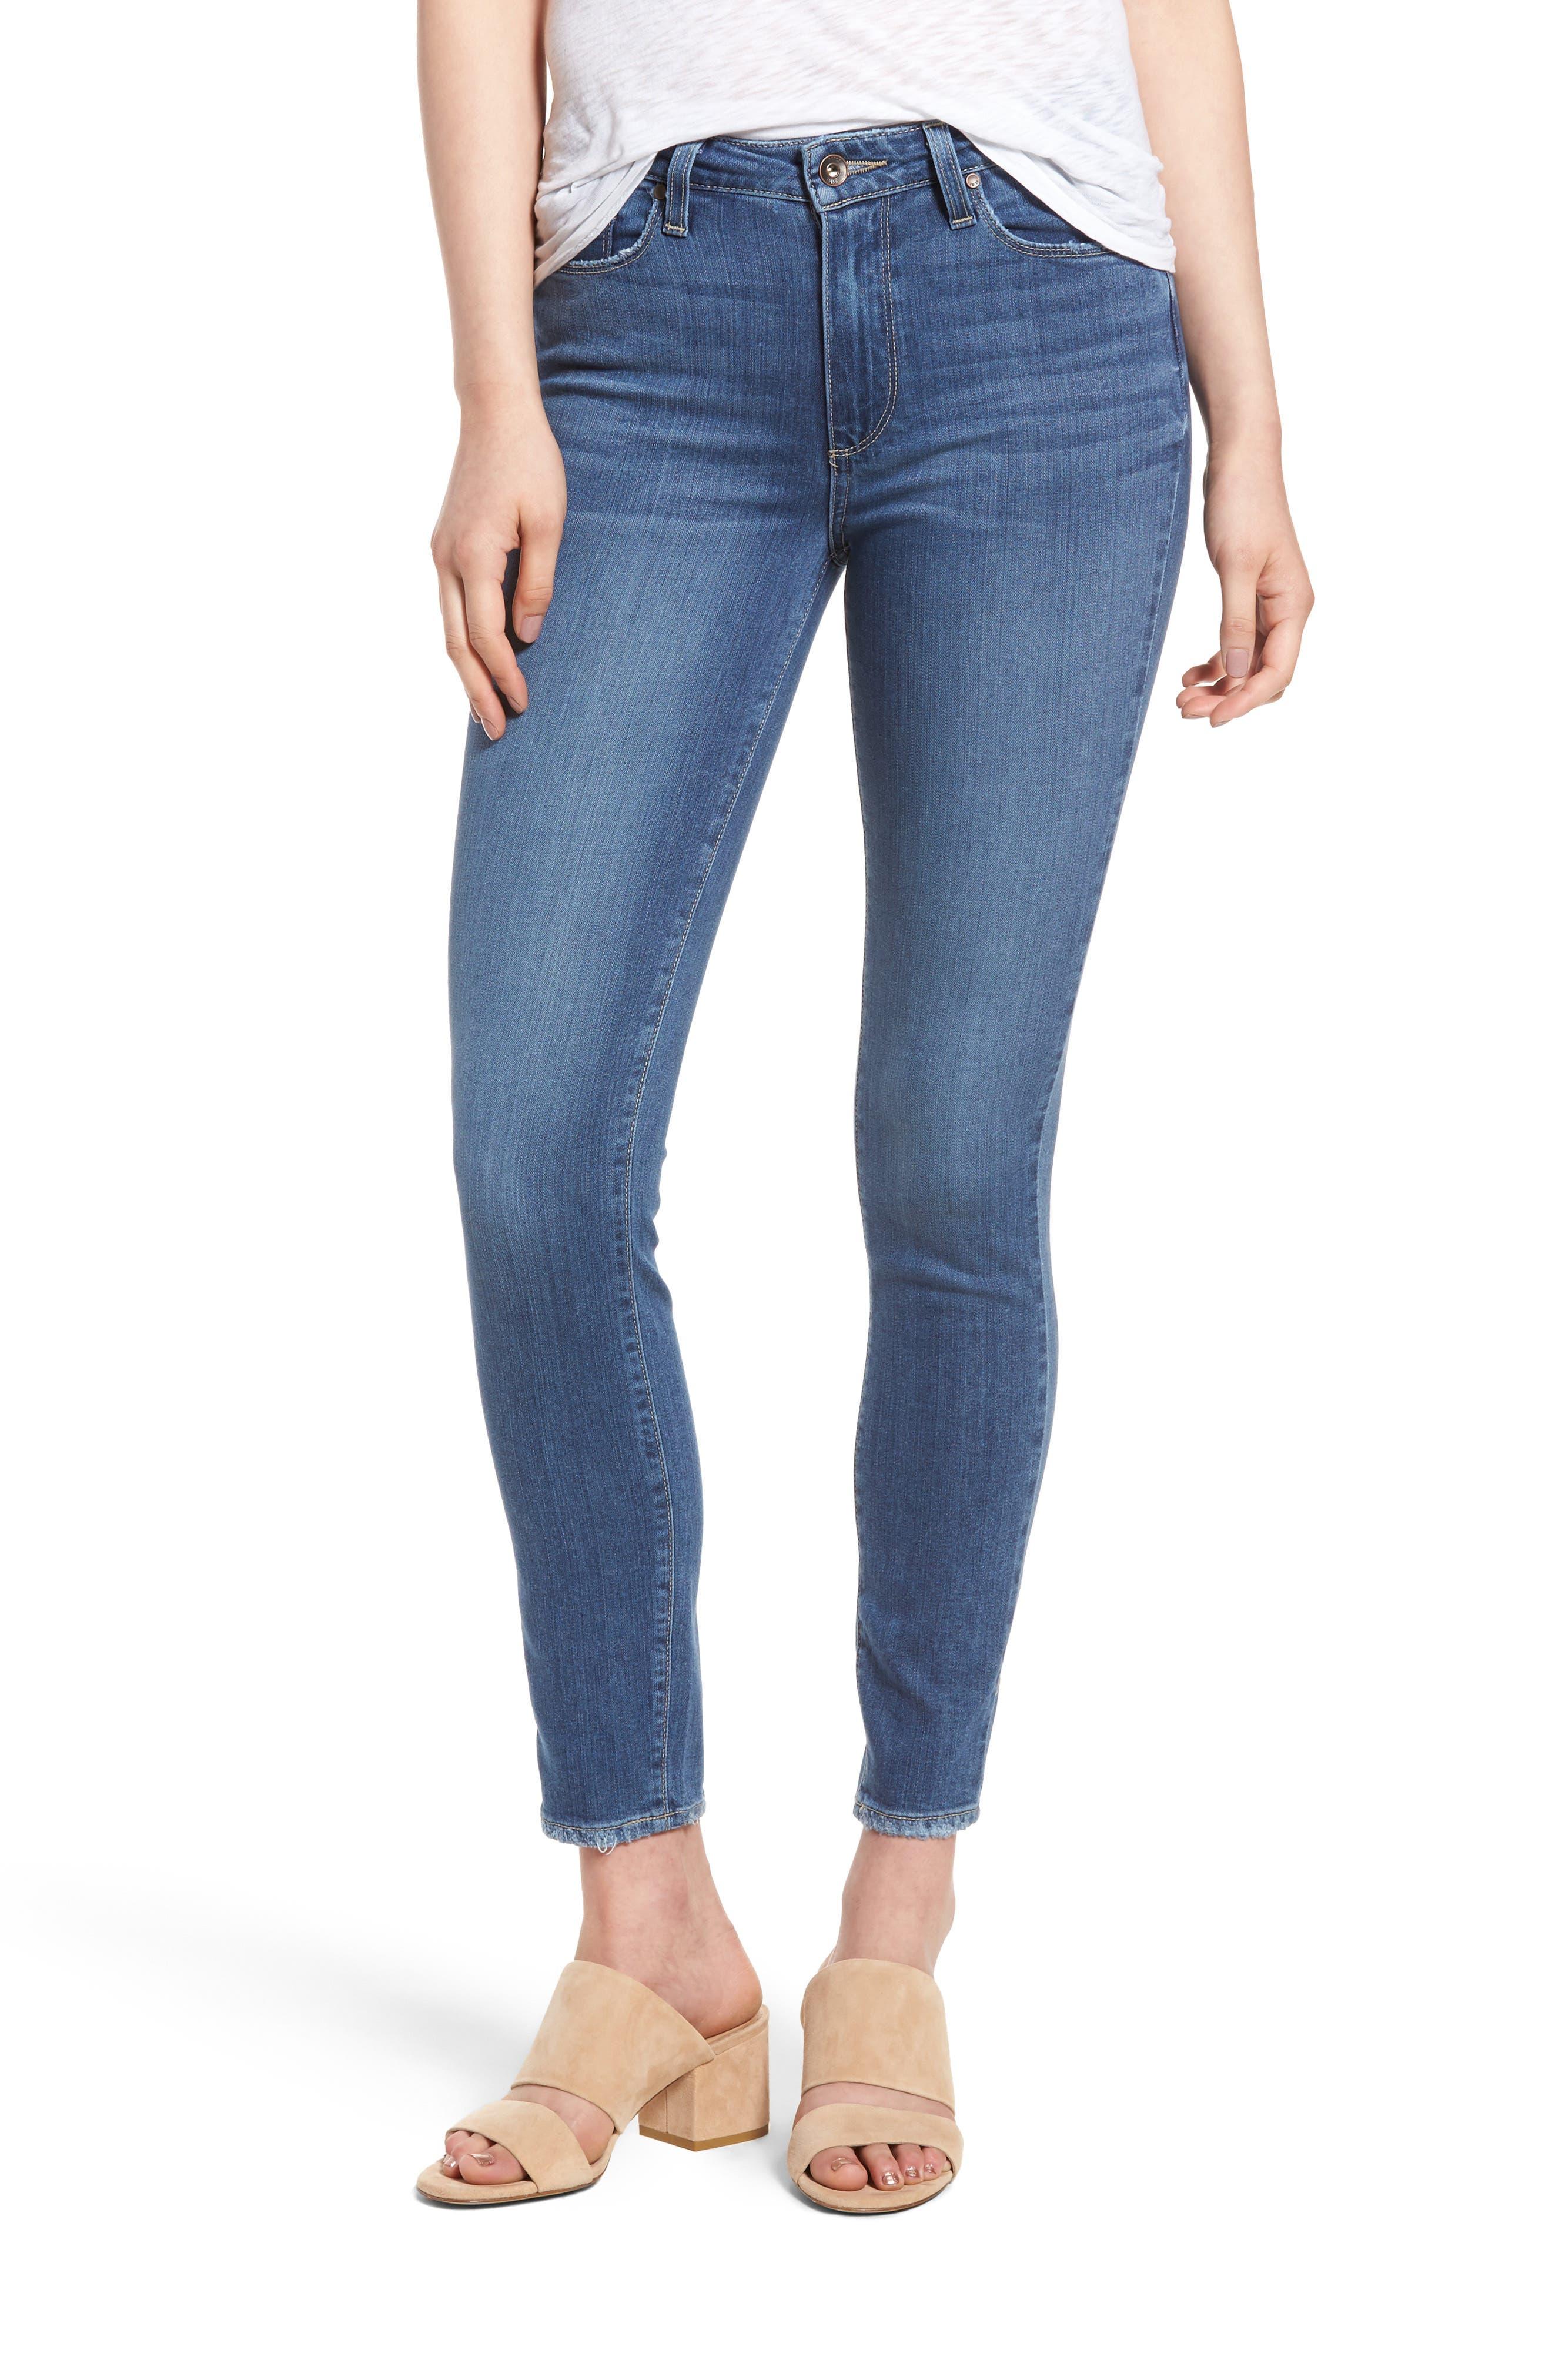 Hoxton High Waist Ankle Skinny Jeans,                             Main thumbnail 1, color,                             400